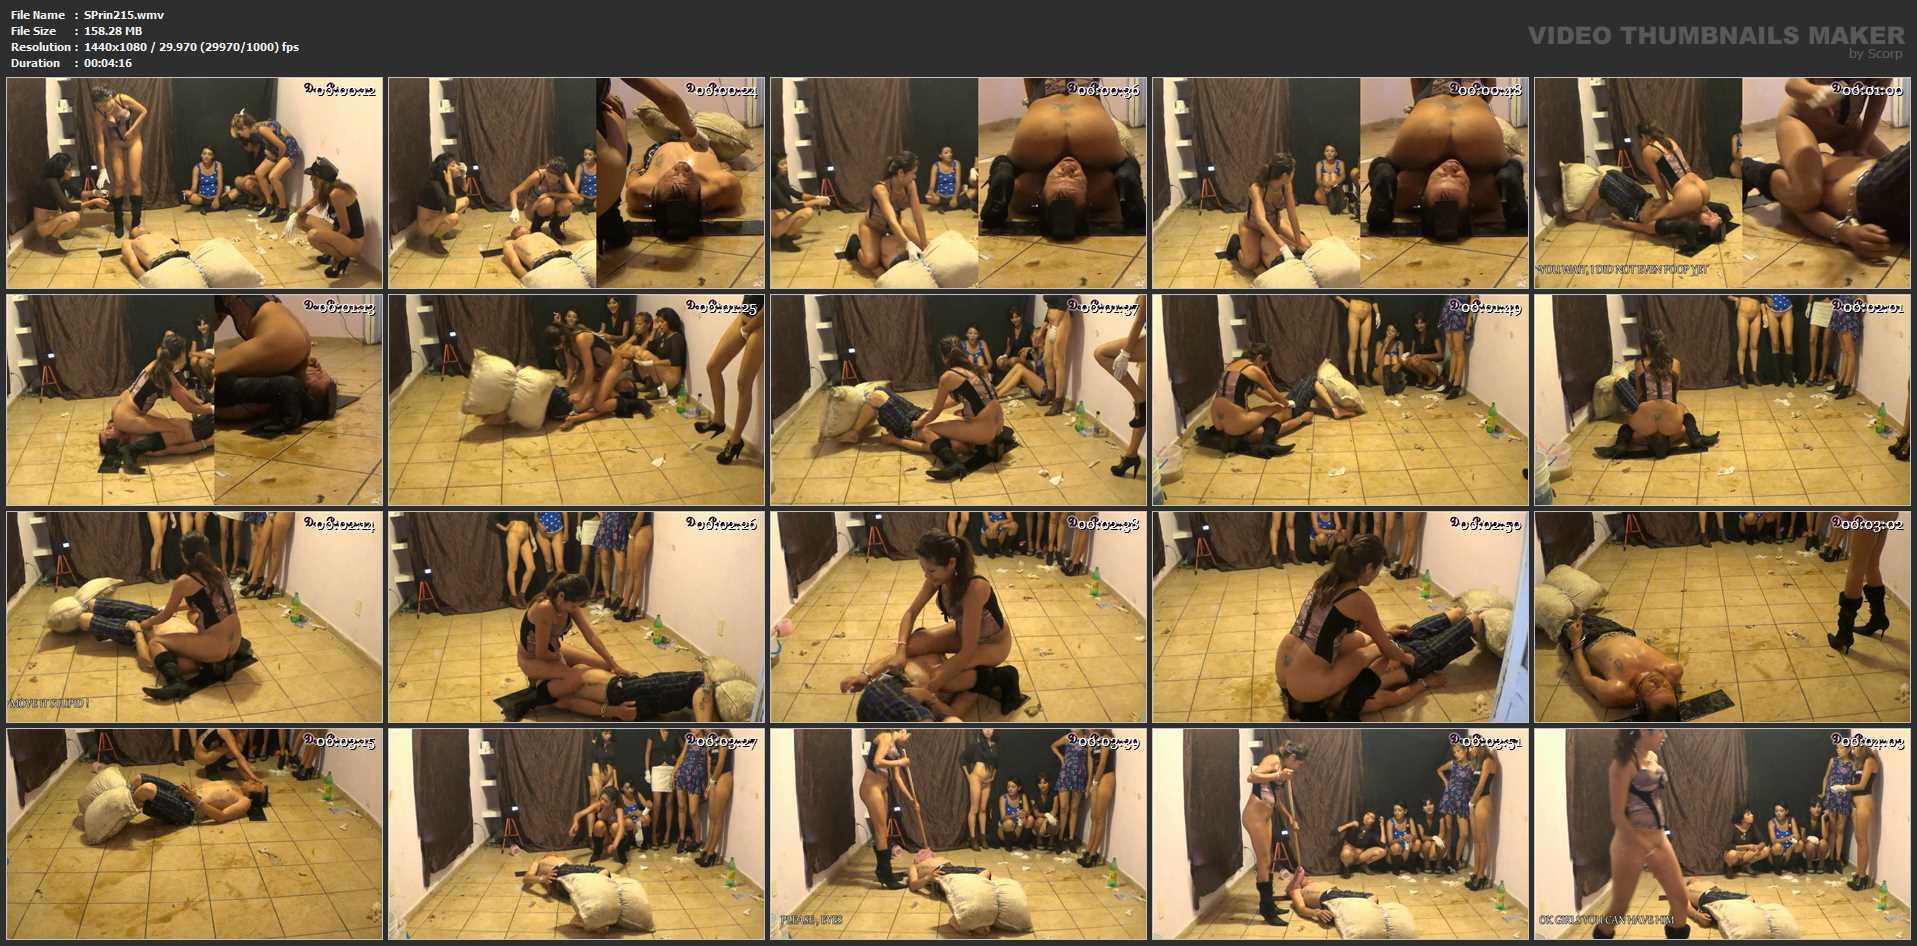 [SCAT-PRINCESS] Horse Back Riding Princess Style Part 4 Andrea [FULL HD][1080p][WMV]